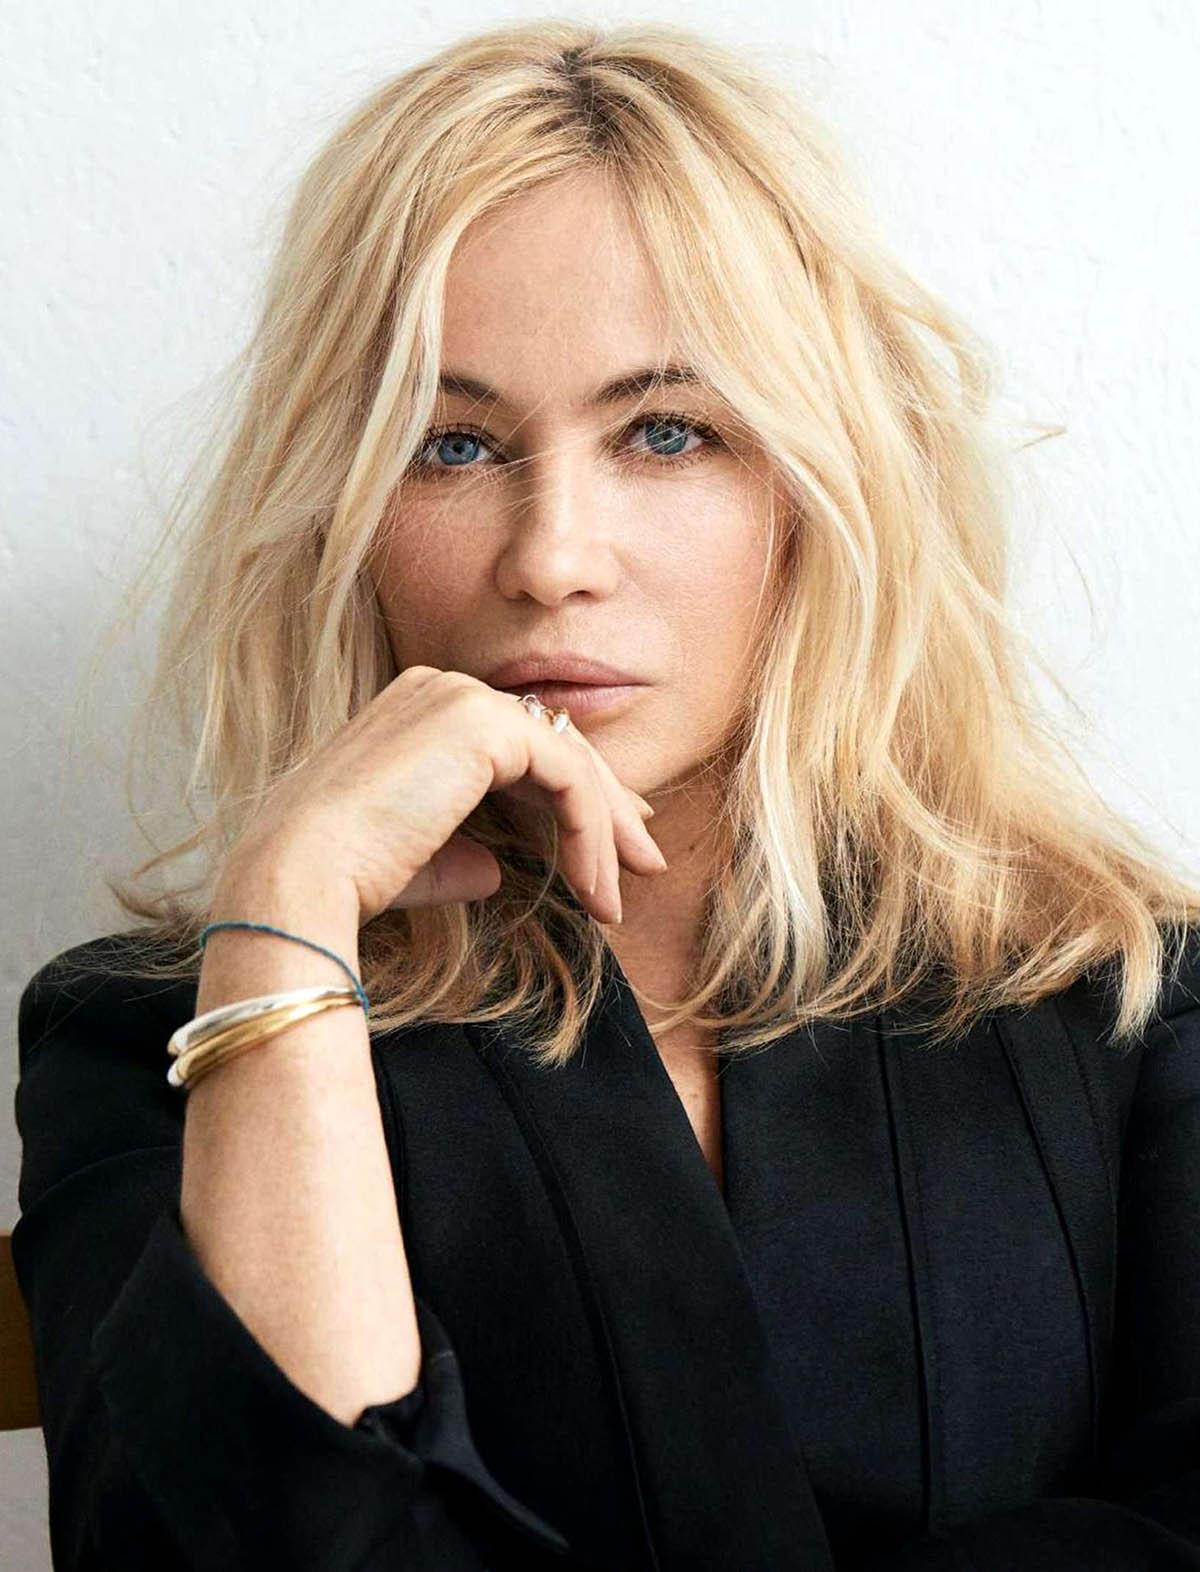 Emmanuelle Béart covers Elle France February 12th, 2021 by Dant Studio